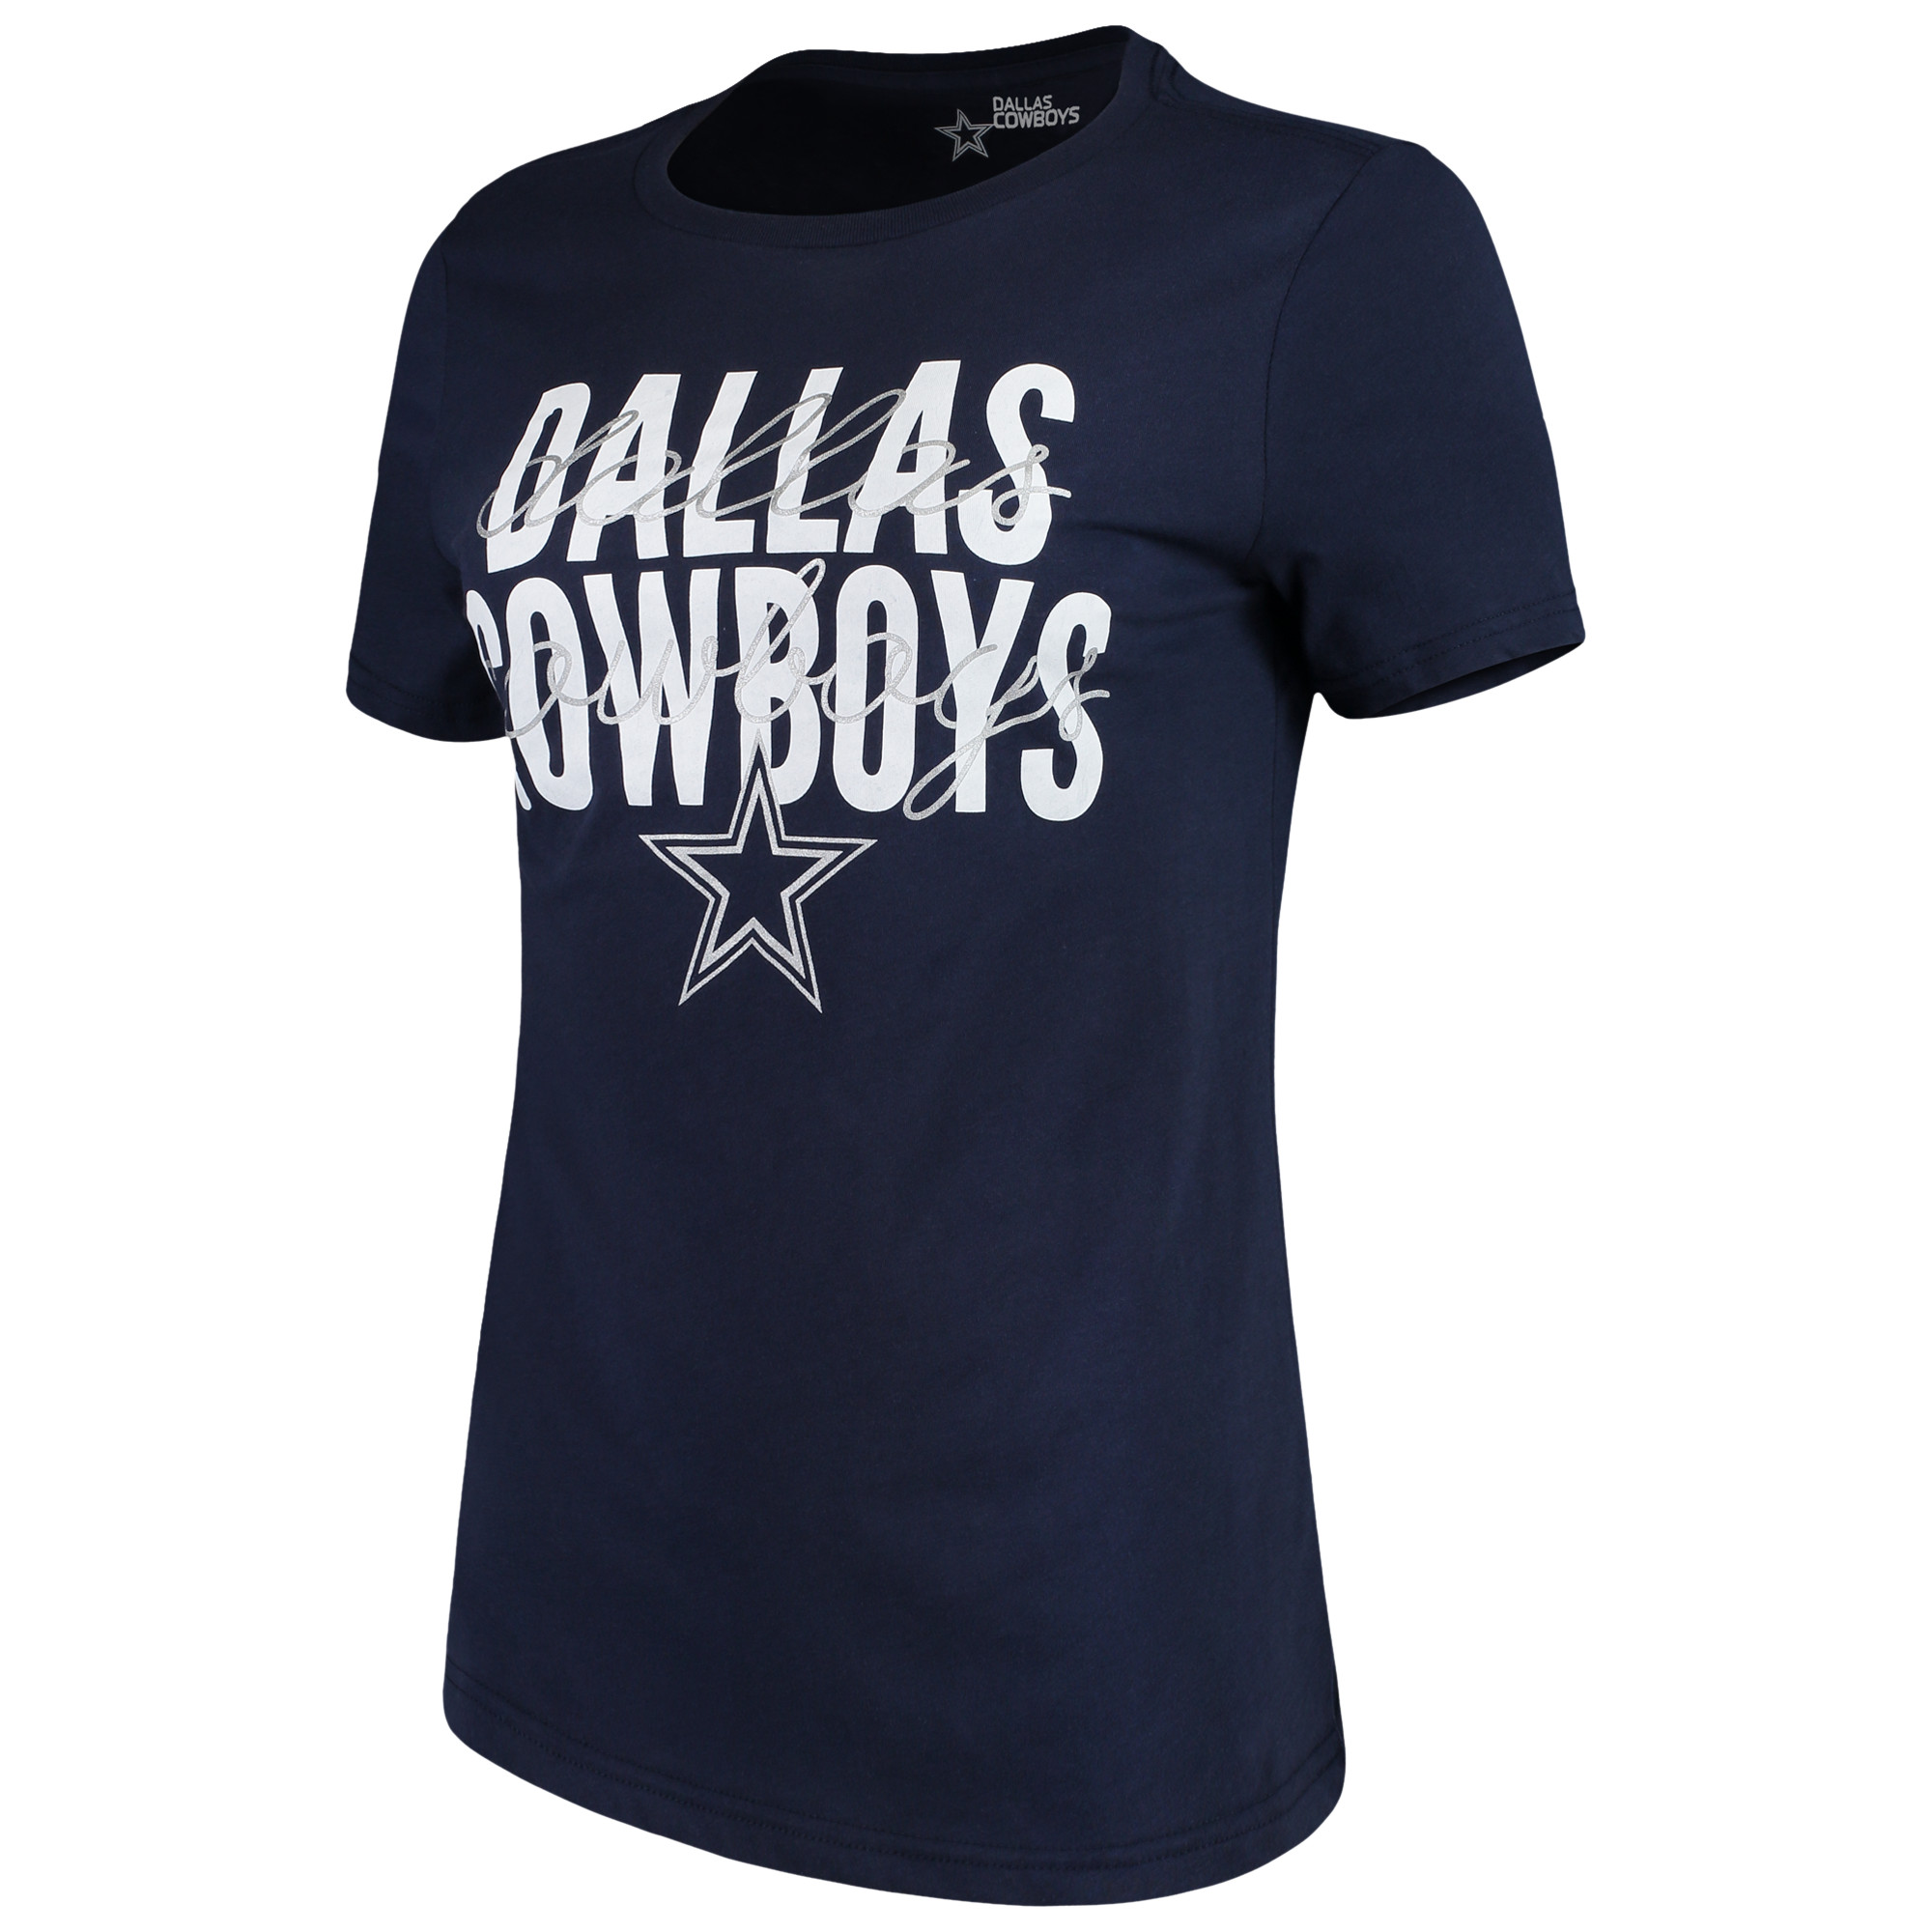 Women's Navy Dallas Cowboys Jaco T-Shirt